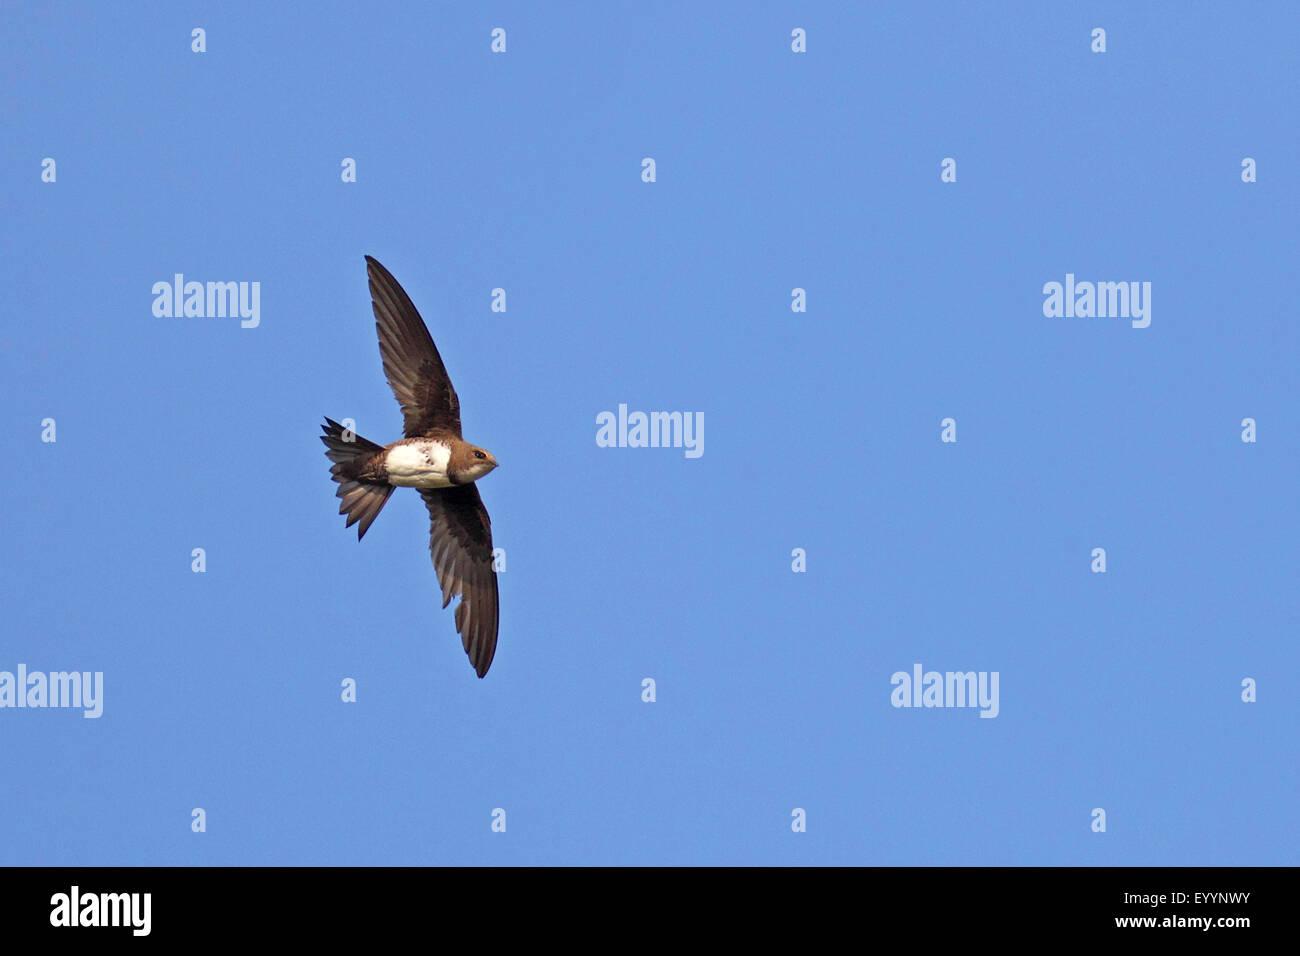 alpine swift (Apus melba, Tachymarptis melba), flying, Bulgaria, Kaliakra Stock Photo